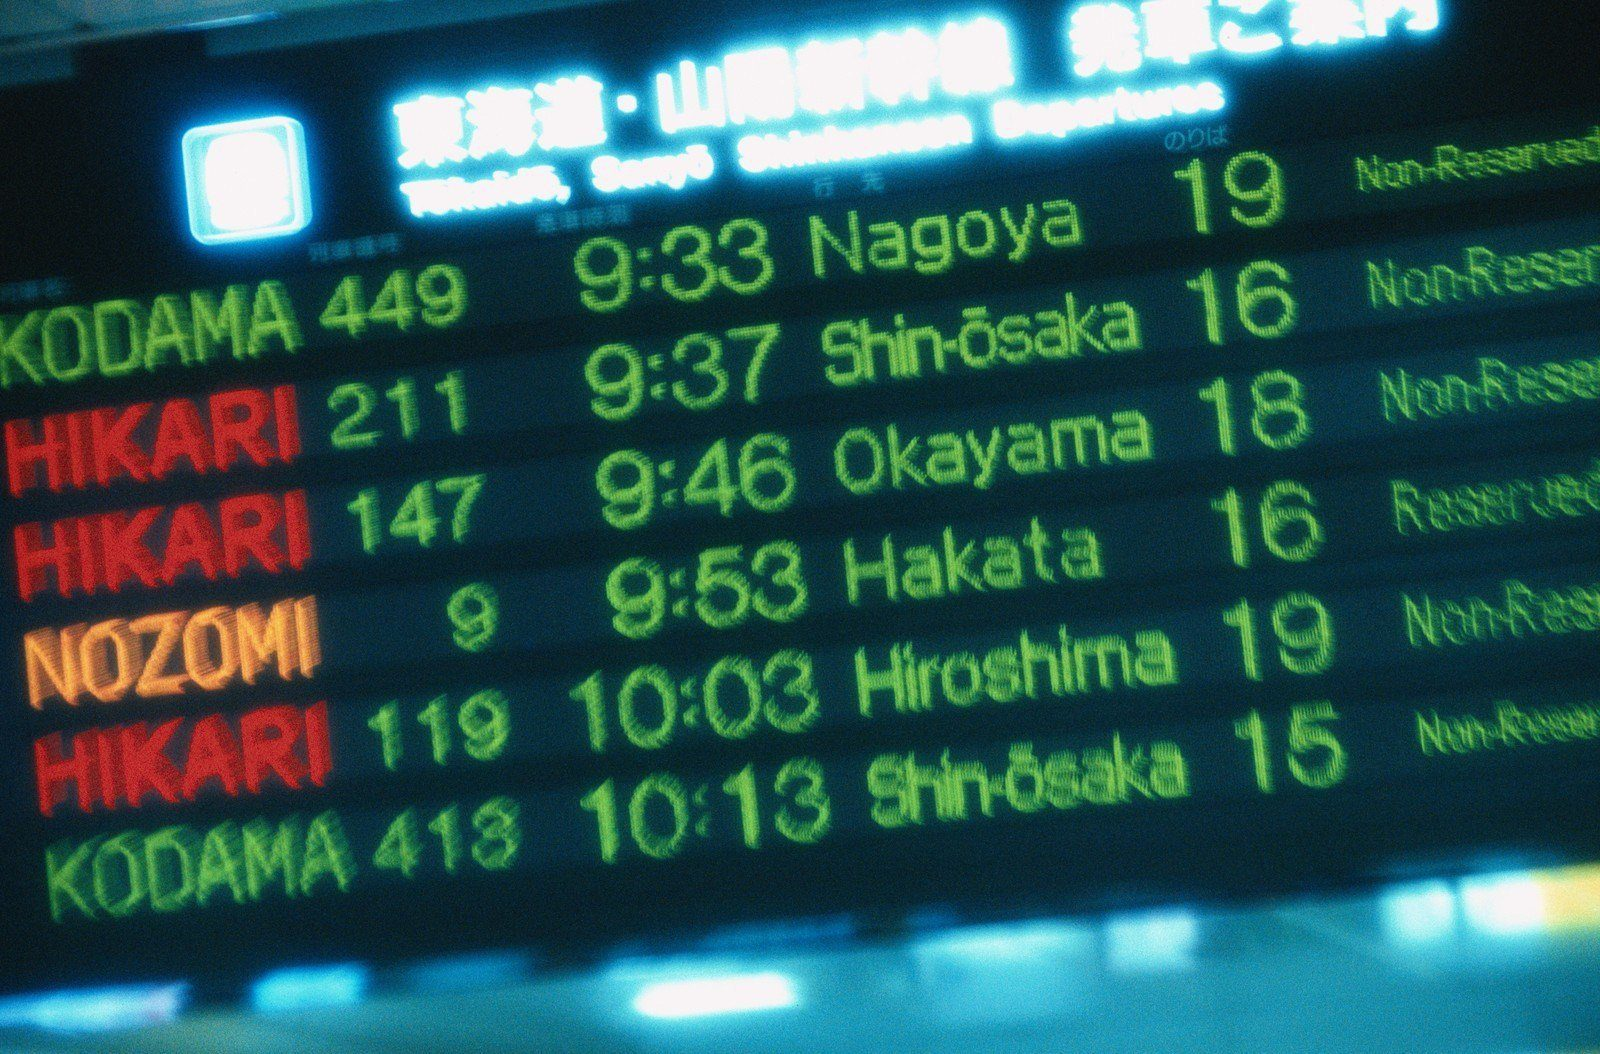 Shinkansen Schedule Board in Japan